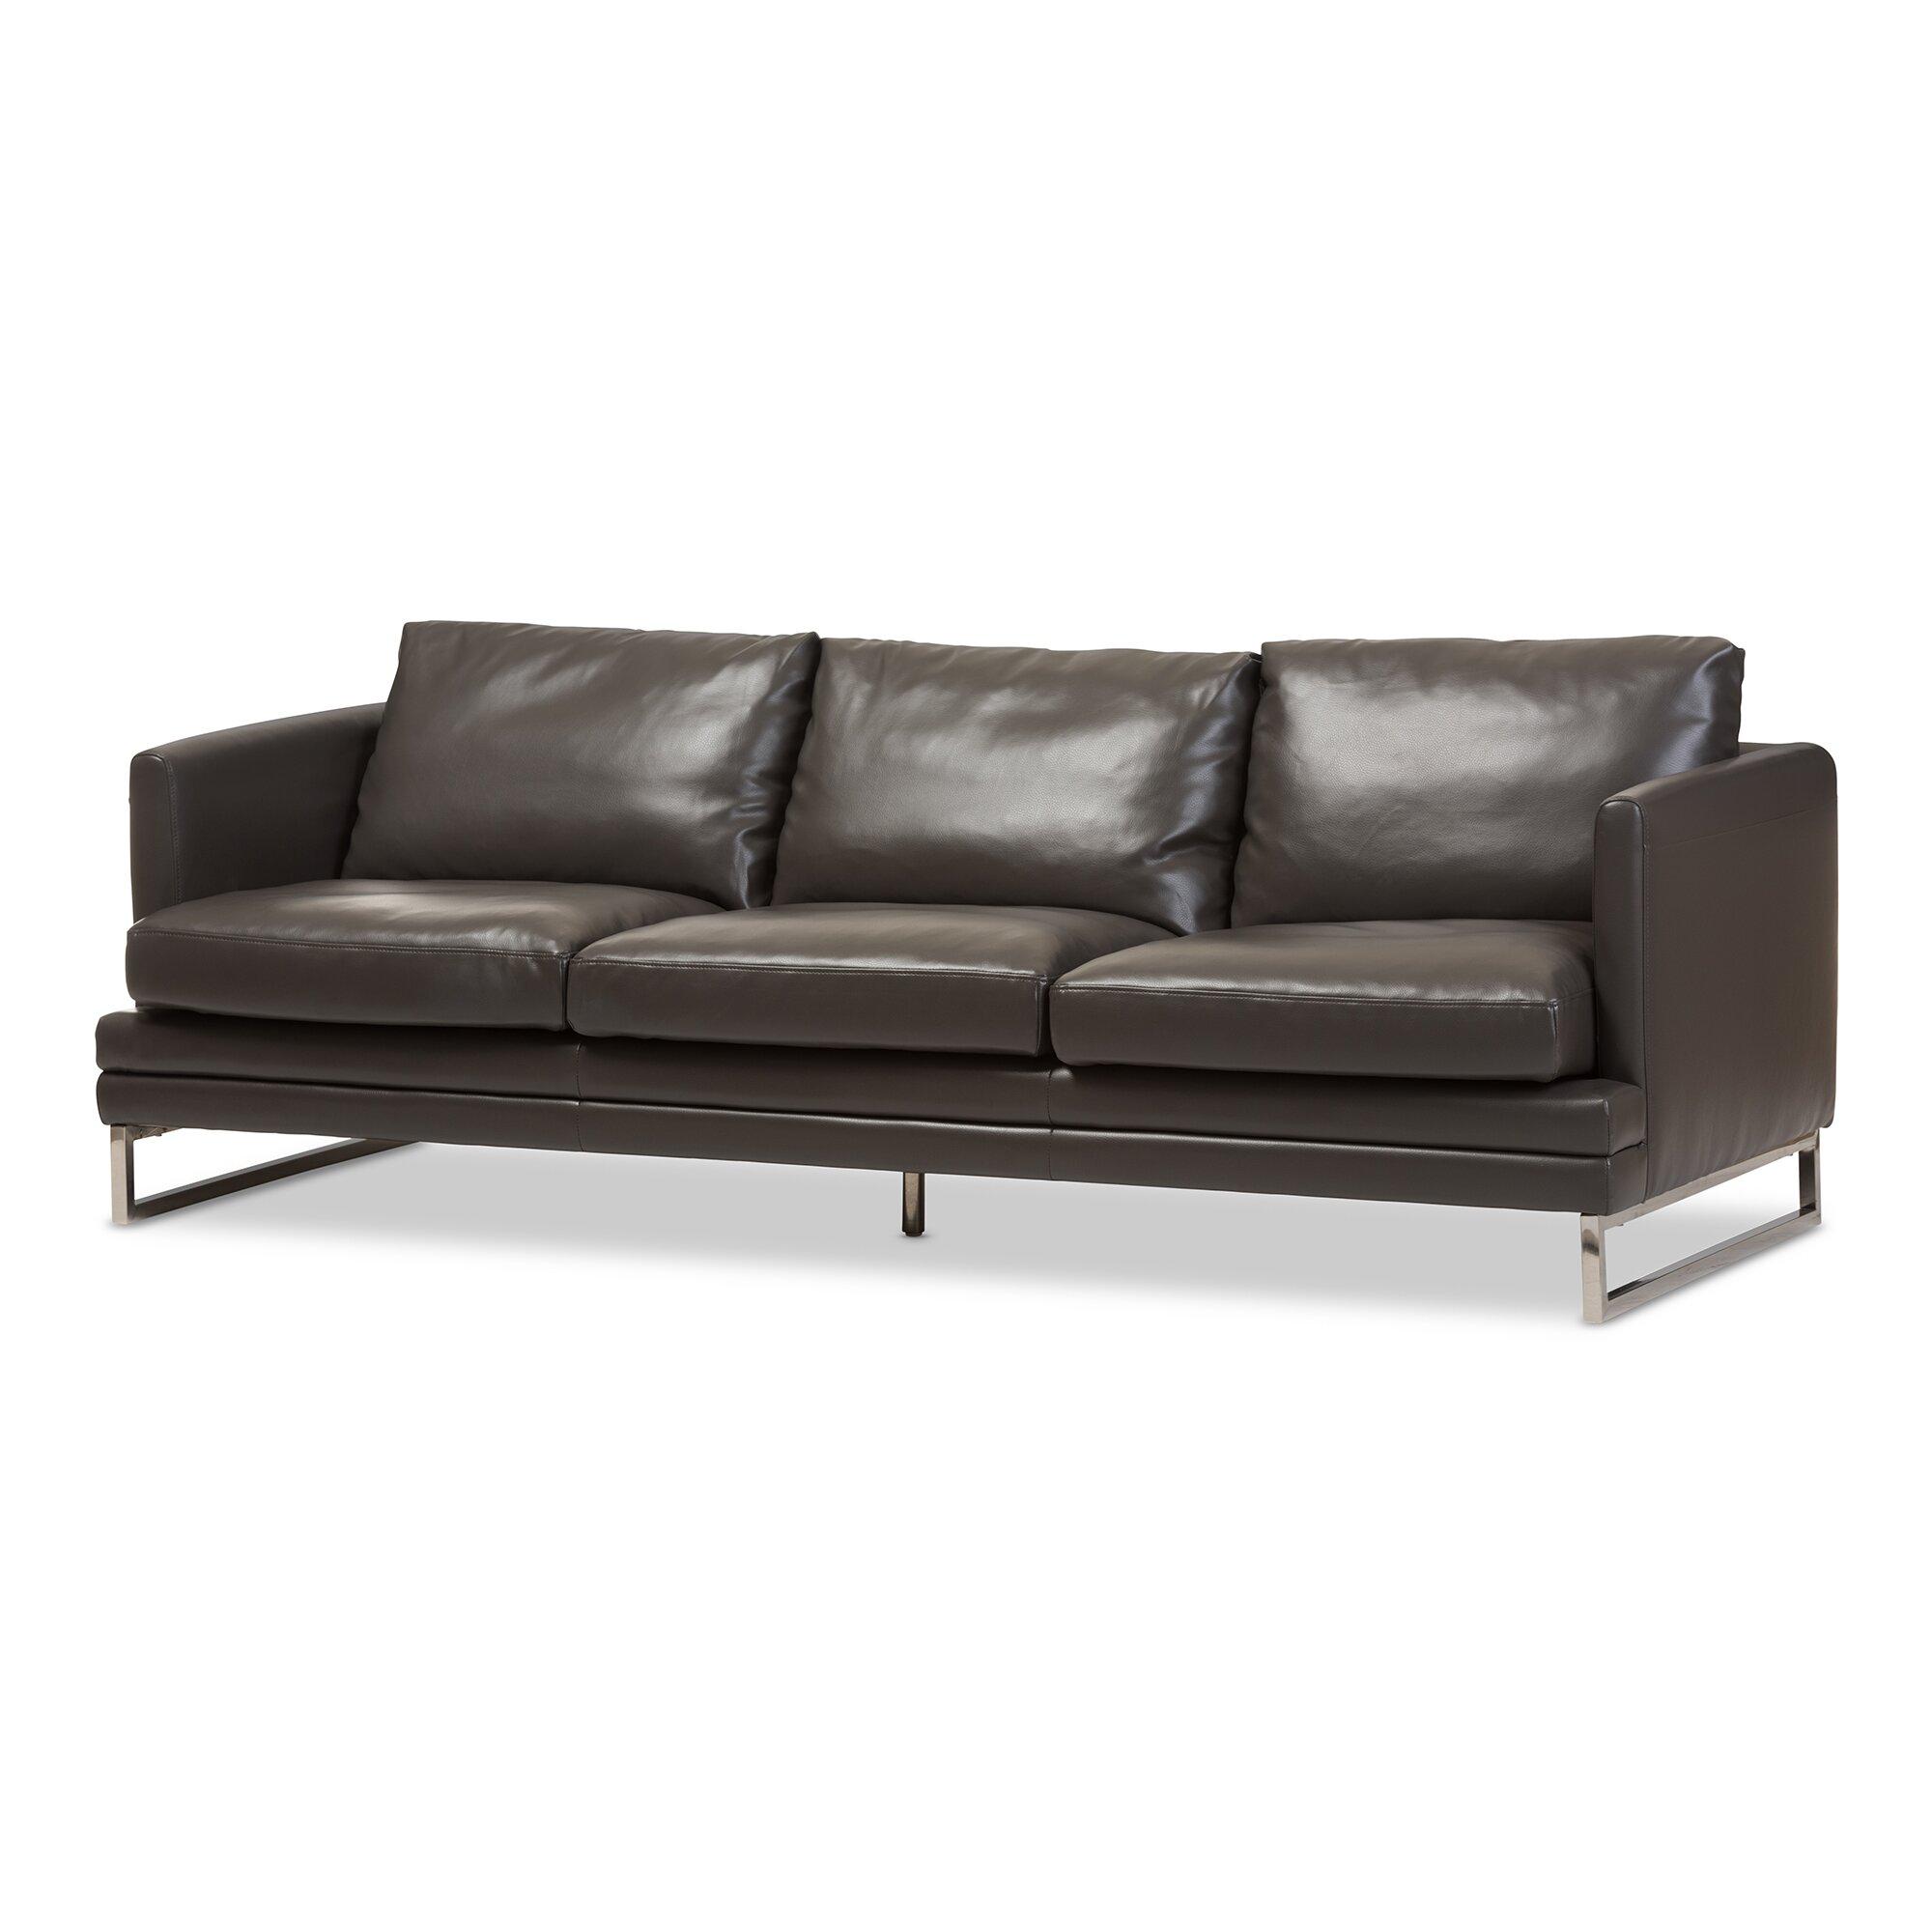 Wholesale interiors baxton studio dakota leather sofa for Leather sofa reviews